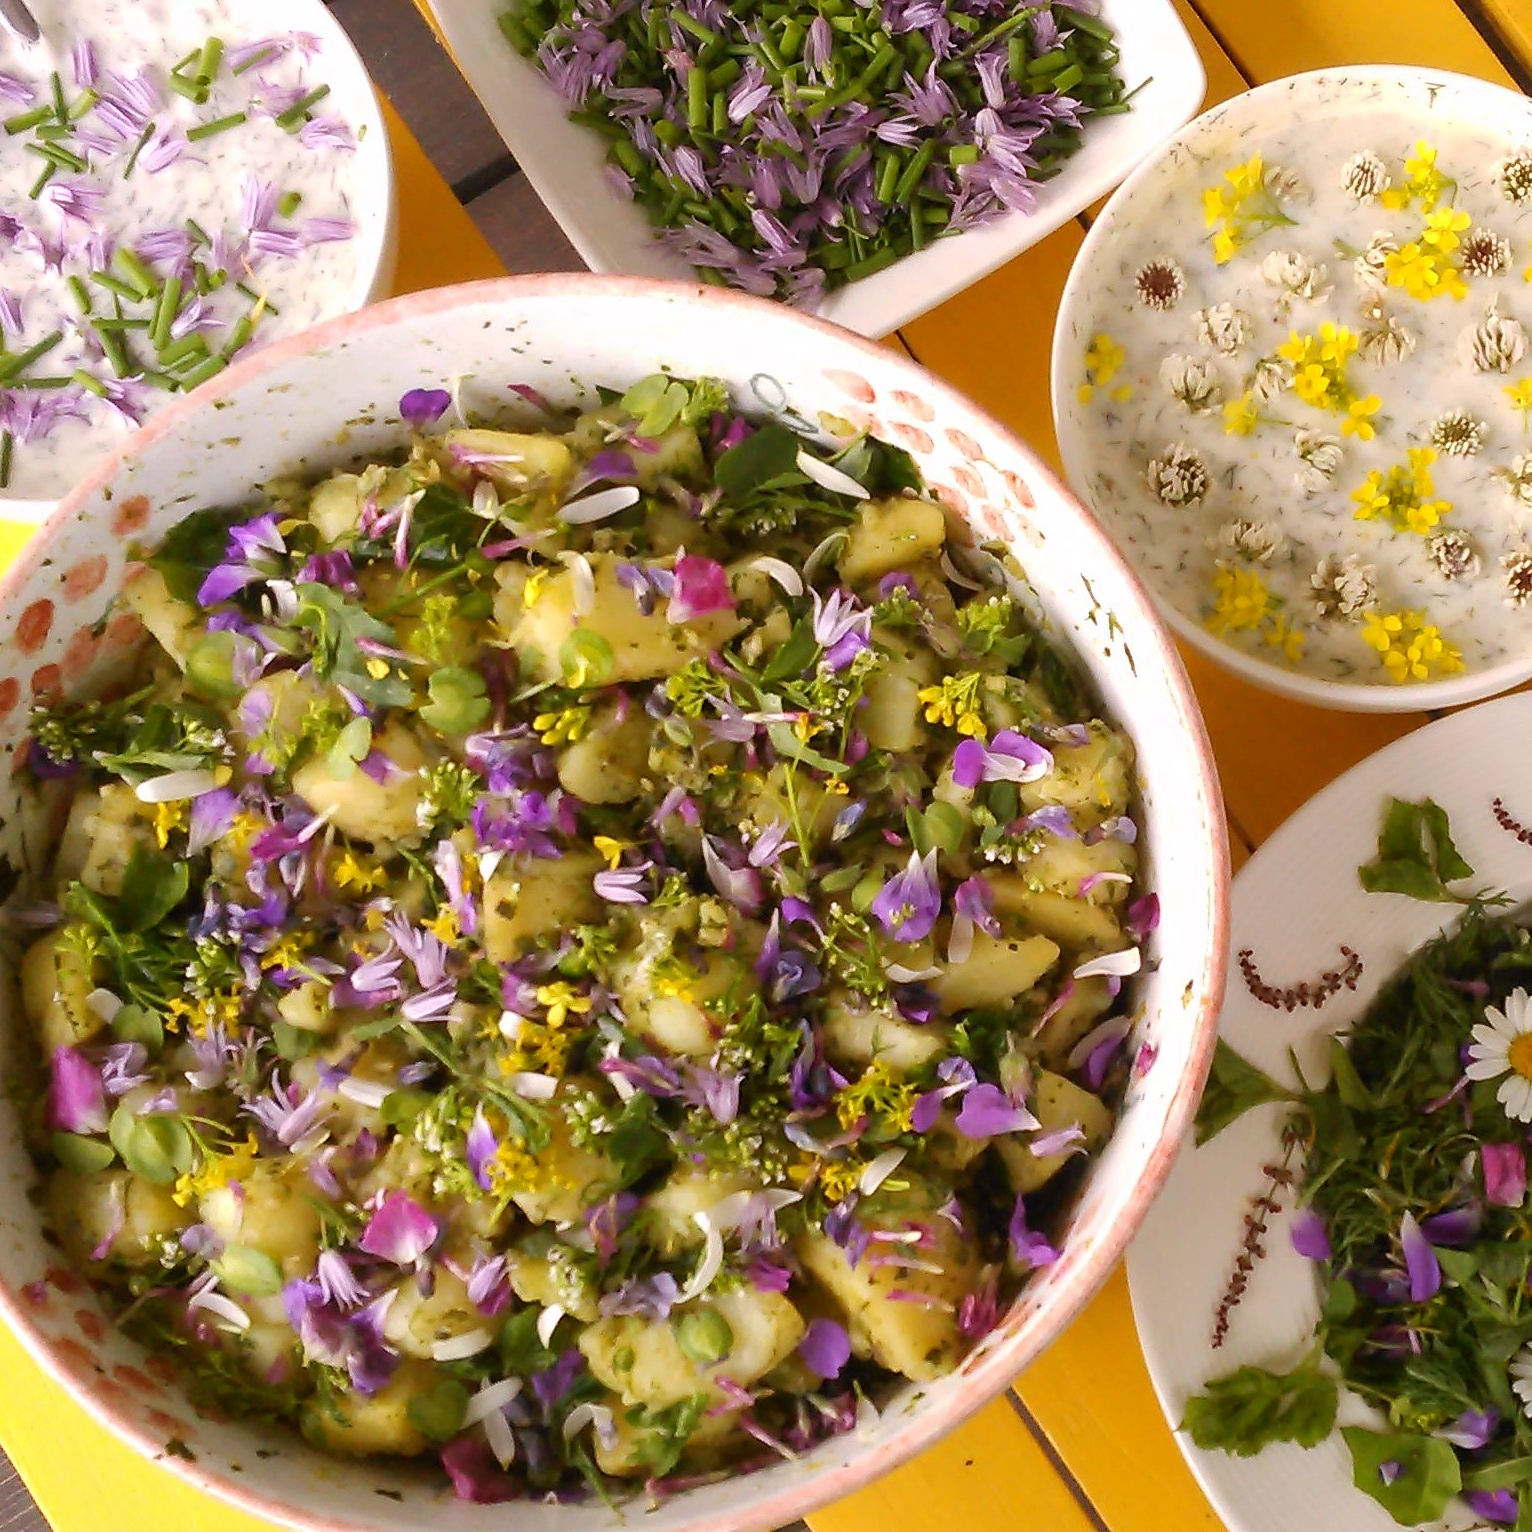 Blomstrende potetsalat